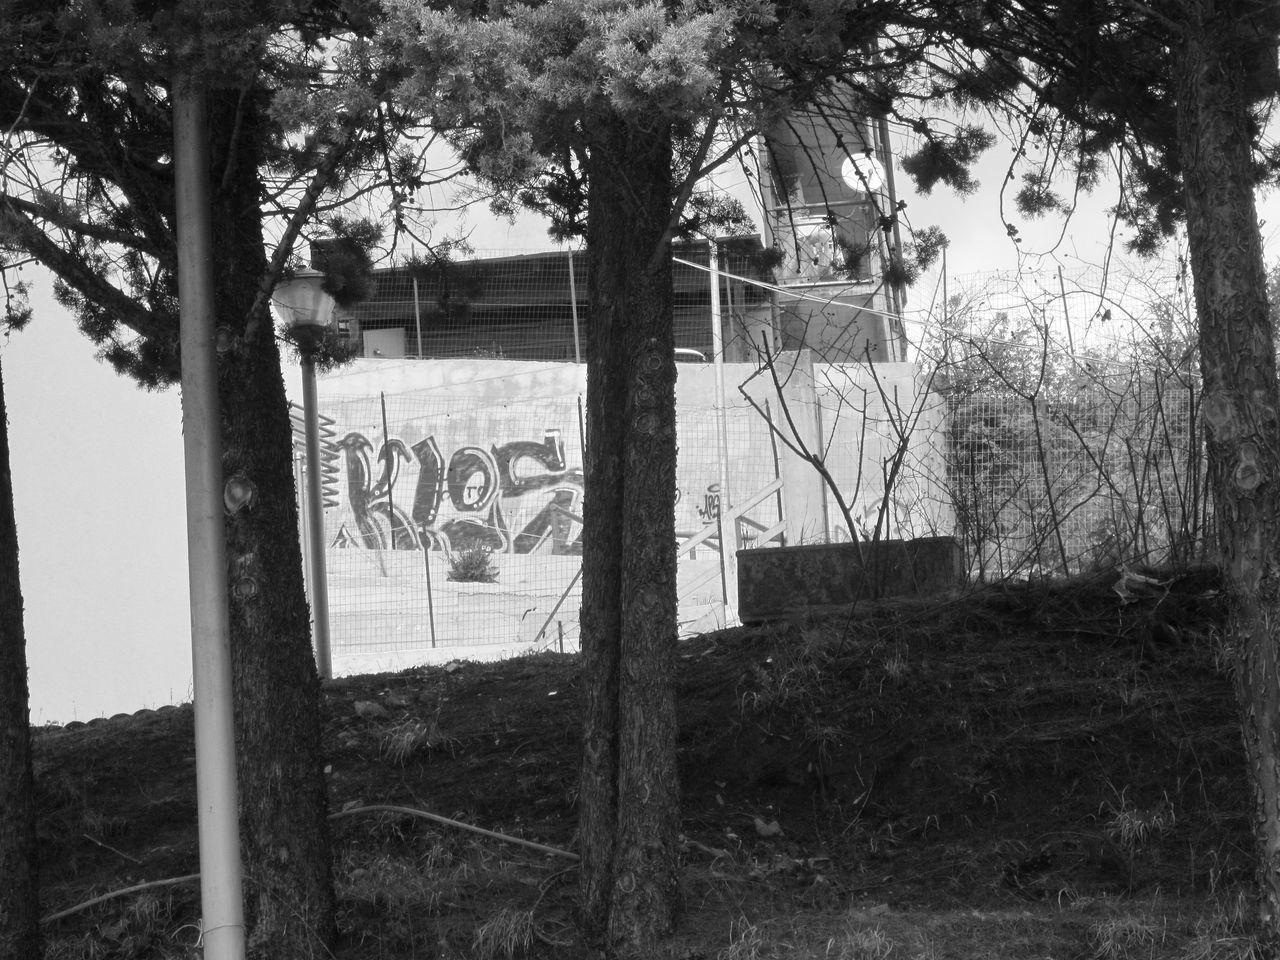 #basilicata #Black&White #blackandwhite #fotobiancoenero #fotobianconero #gallitello #Italia #italy #lucania #OldPicture #potenza #potenzainferiore #urbanphotography